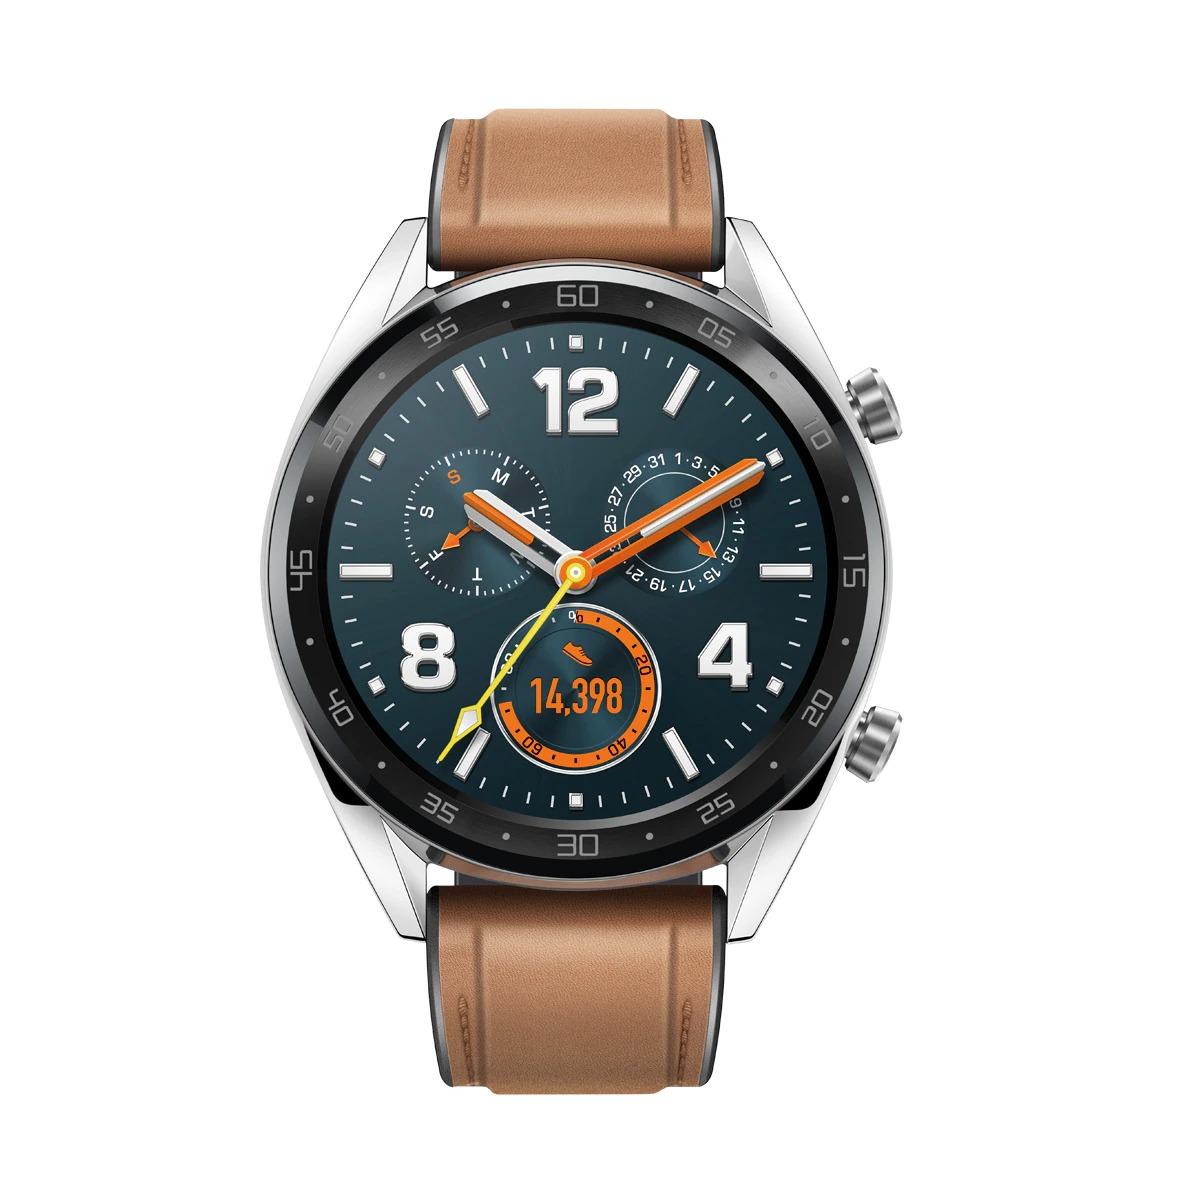 Huawei Watch GT Fashion Smartwatch (Reacondicionado grado A)